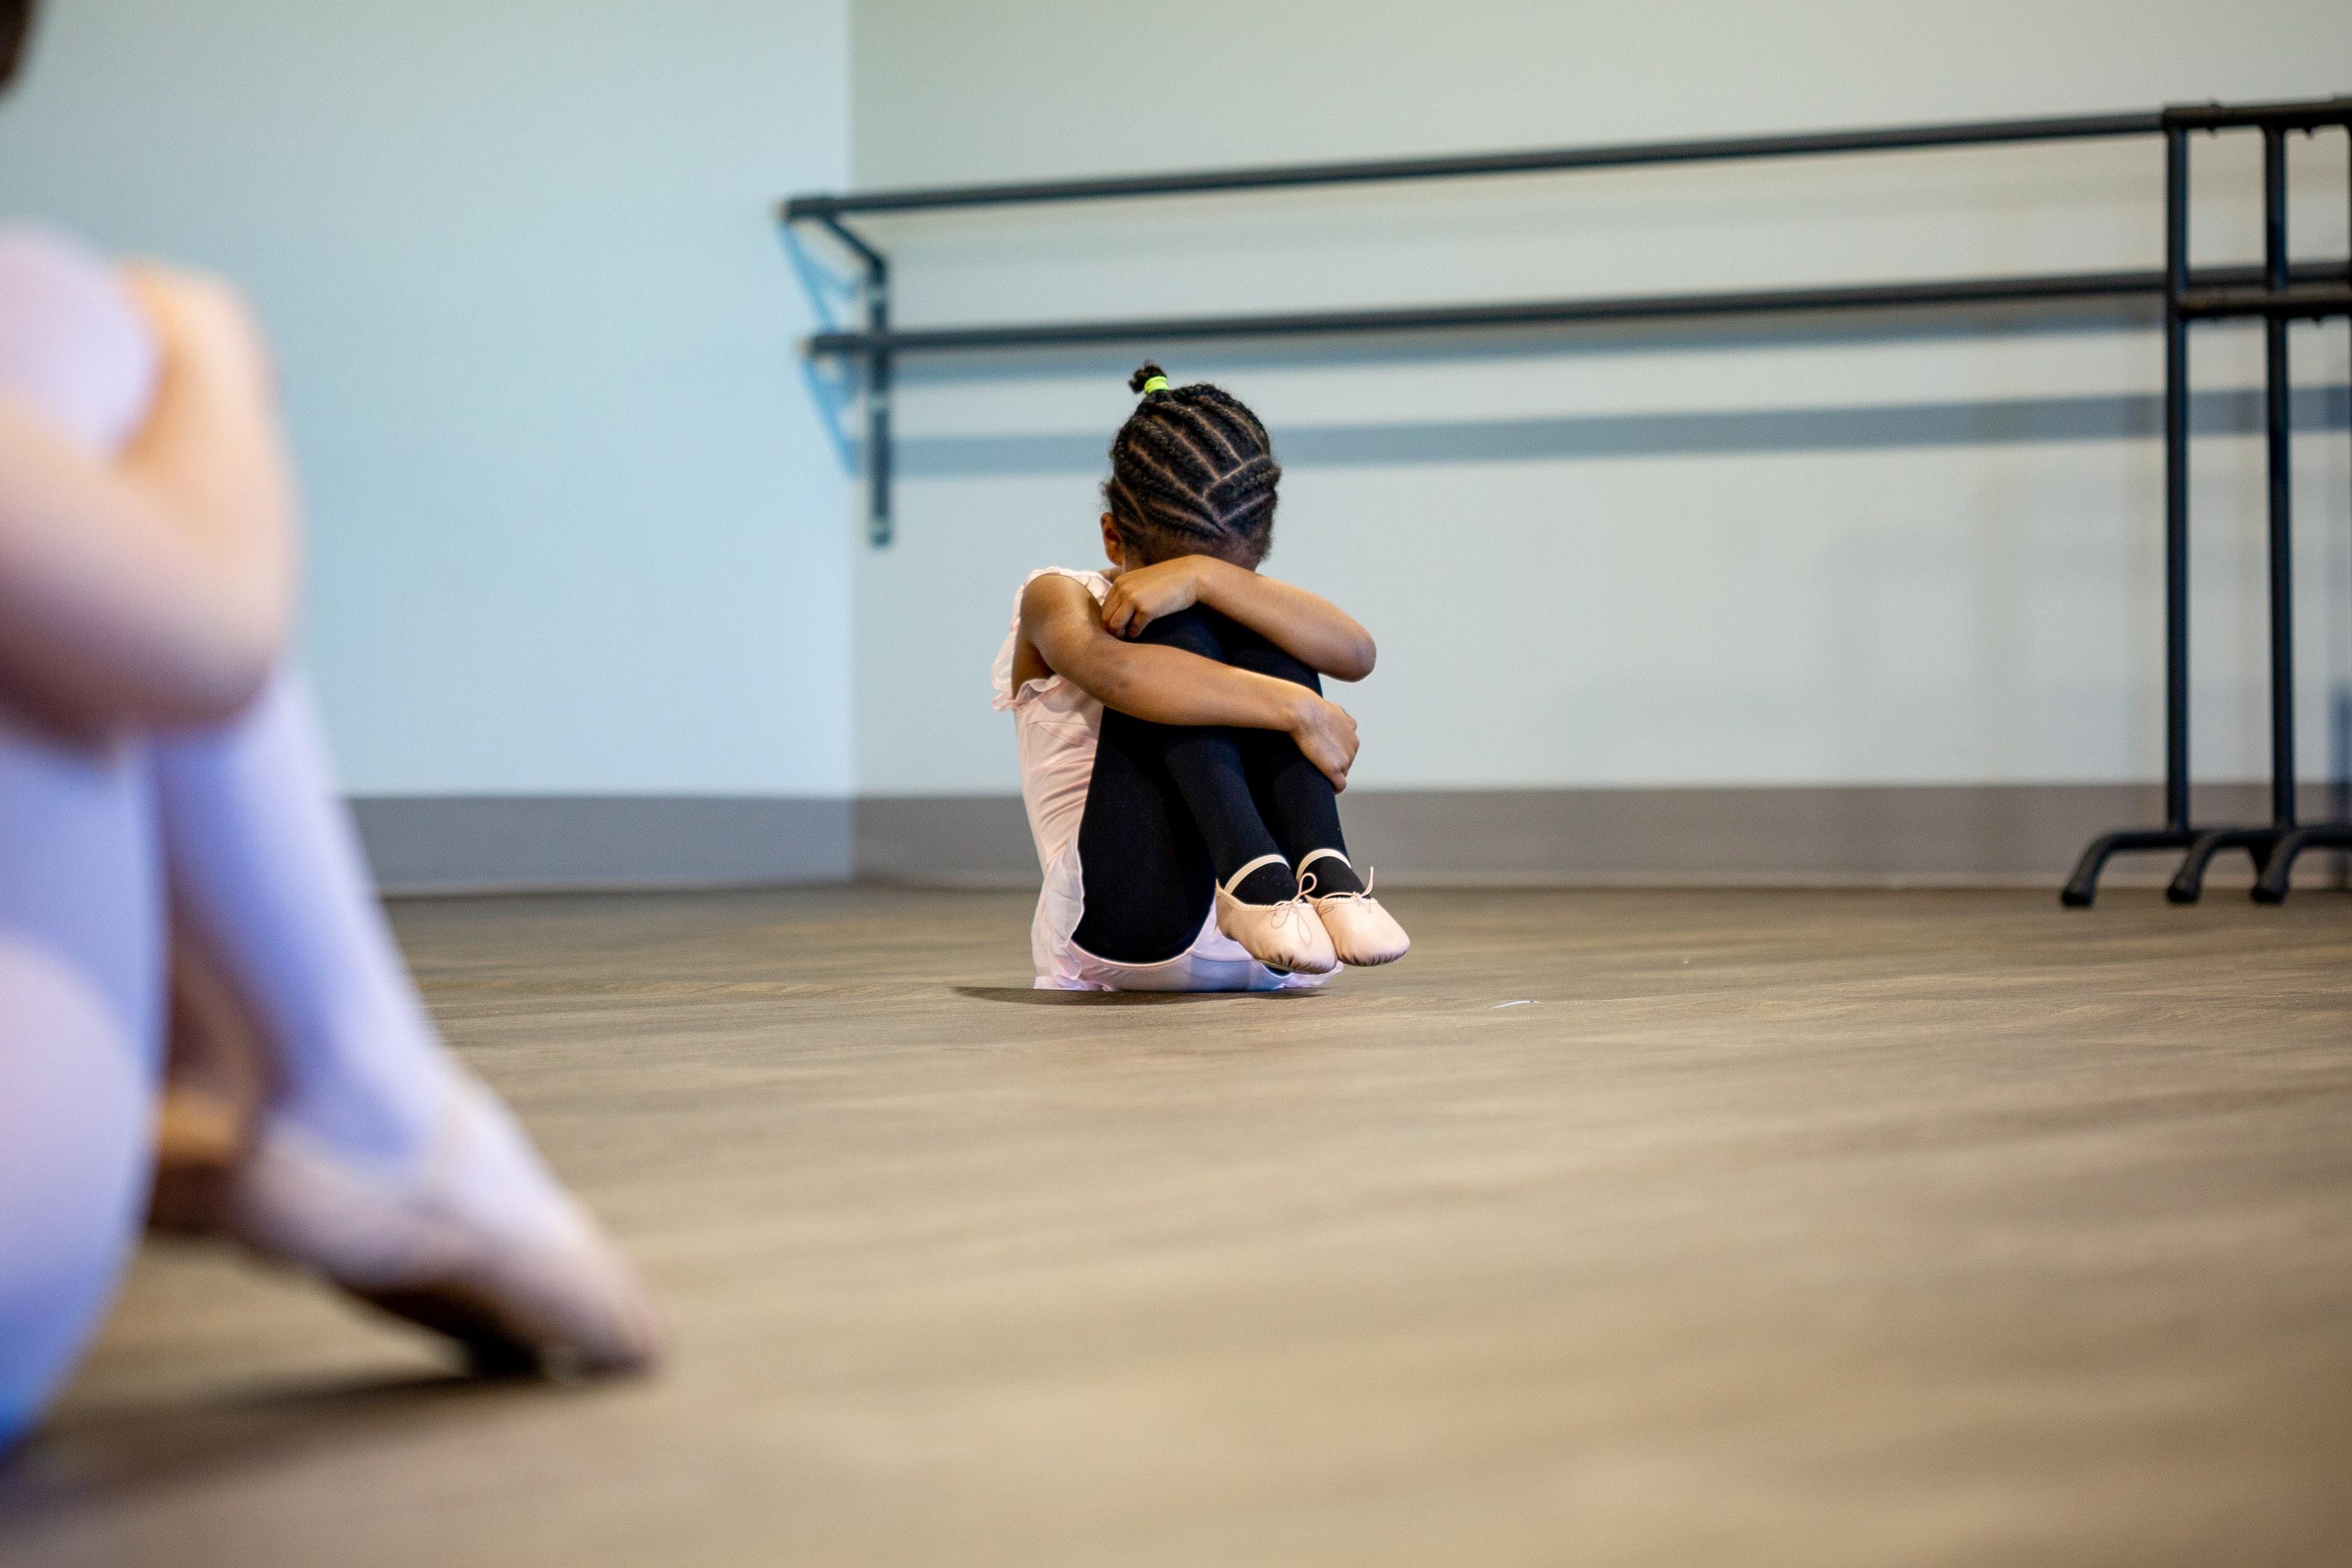 Young, anxious ballet dancer. Photo courtesy of Solen Feyissa via Unsplash